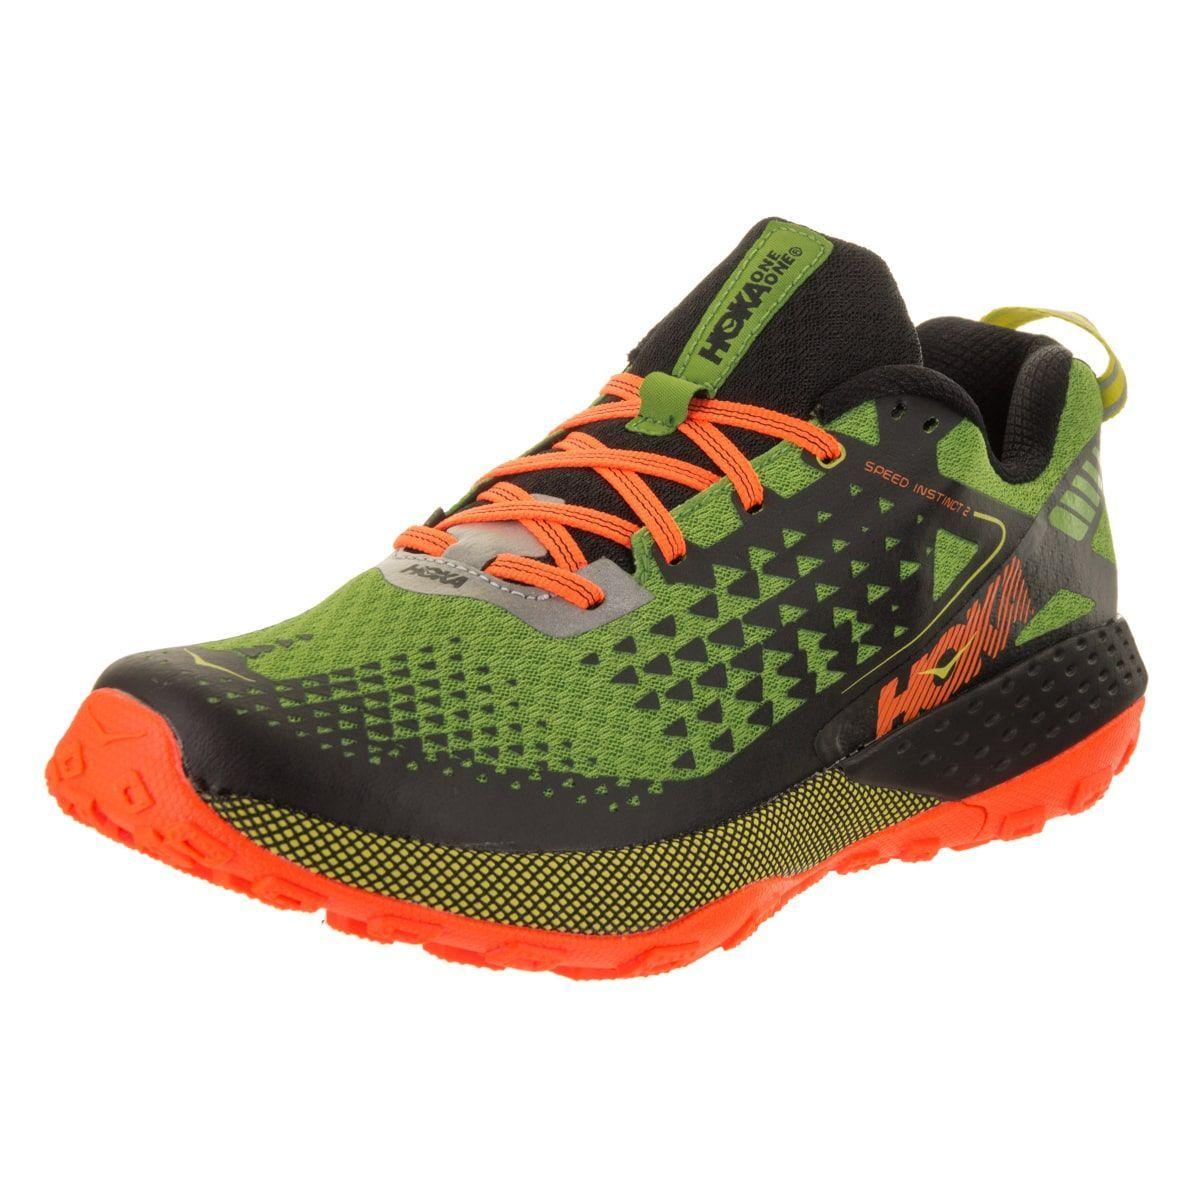 Mens Hoka One One Men's Valor Long Trail Walking Shoe Sale Online Size 47